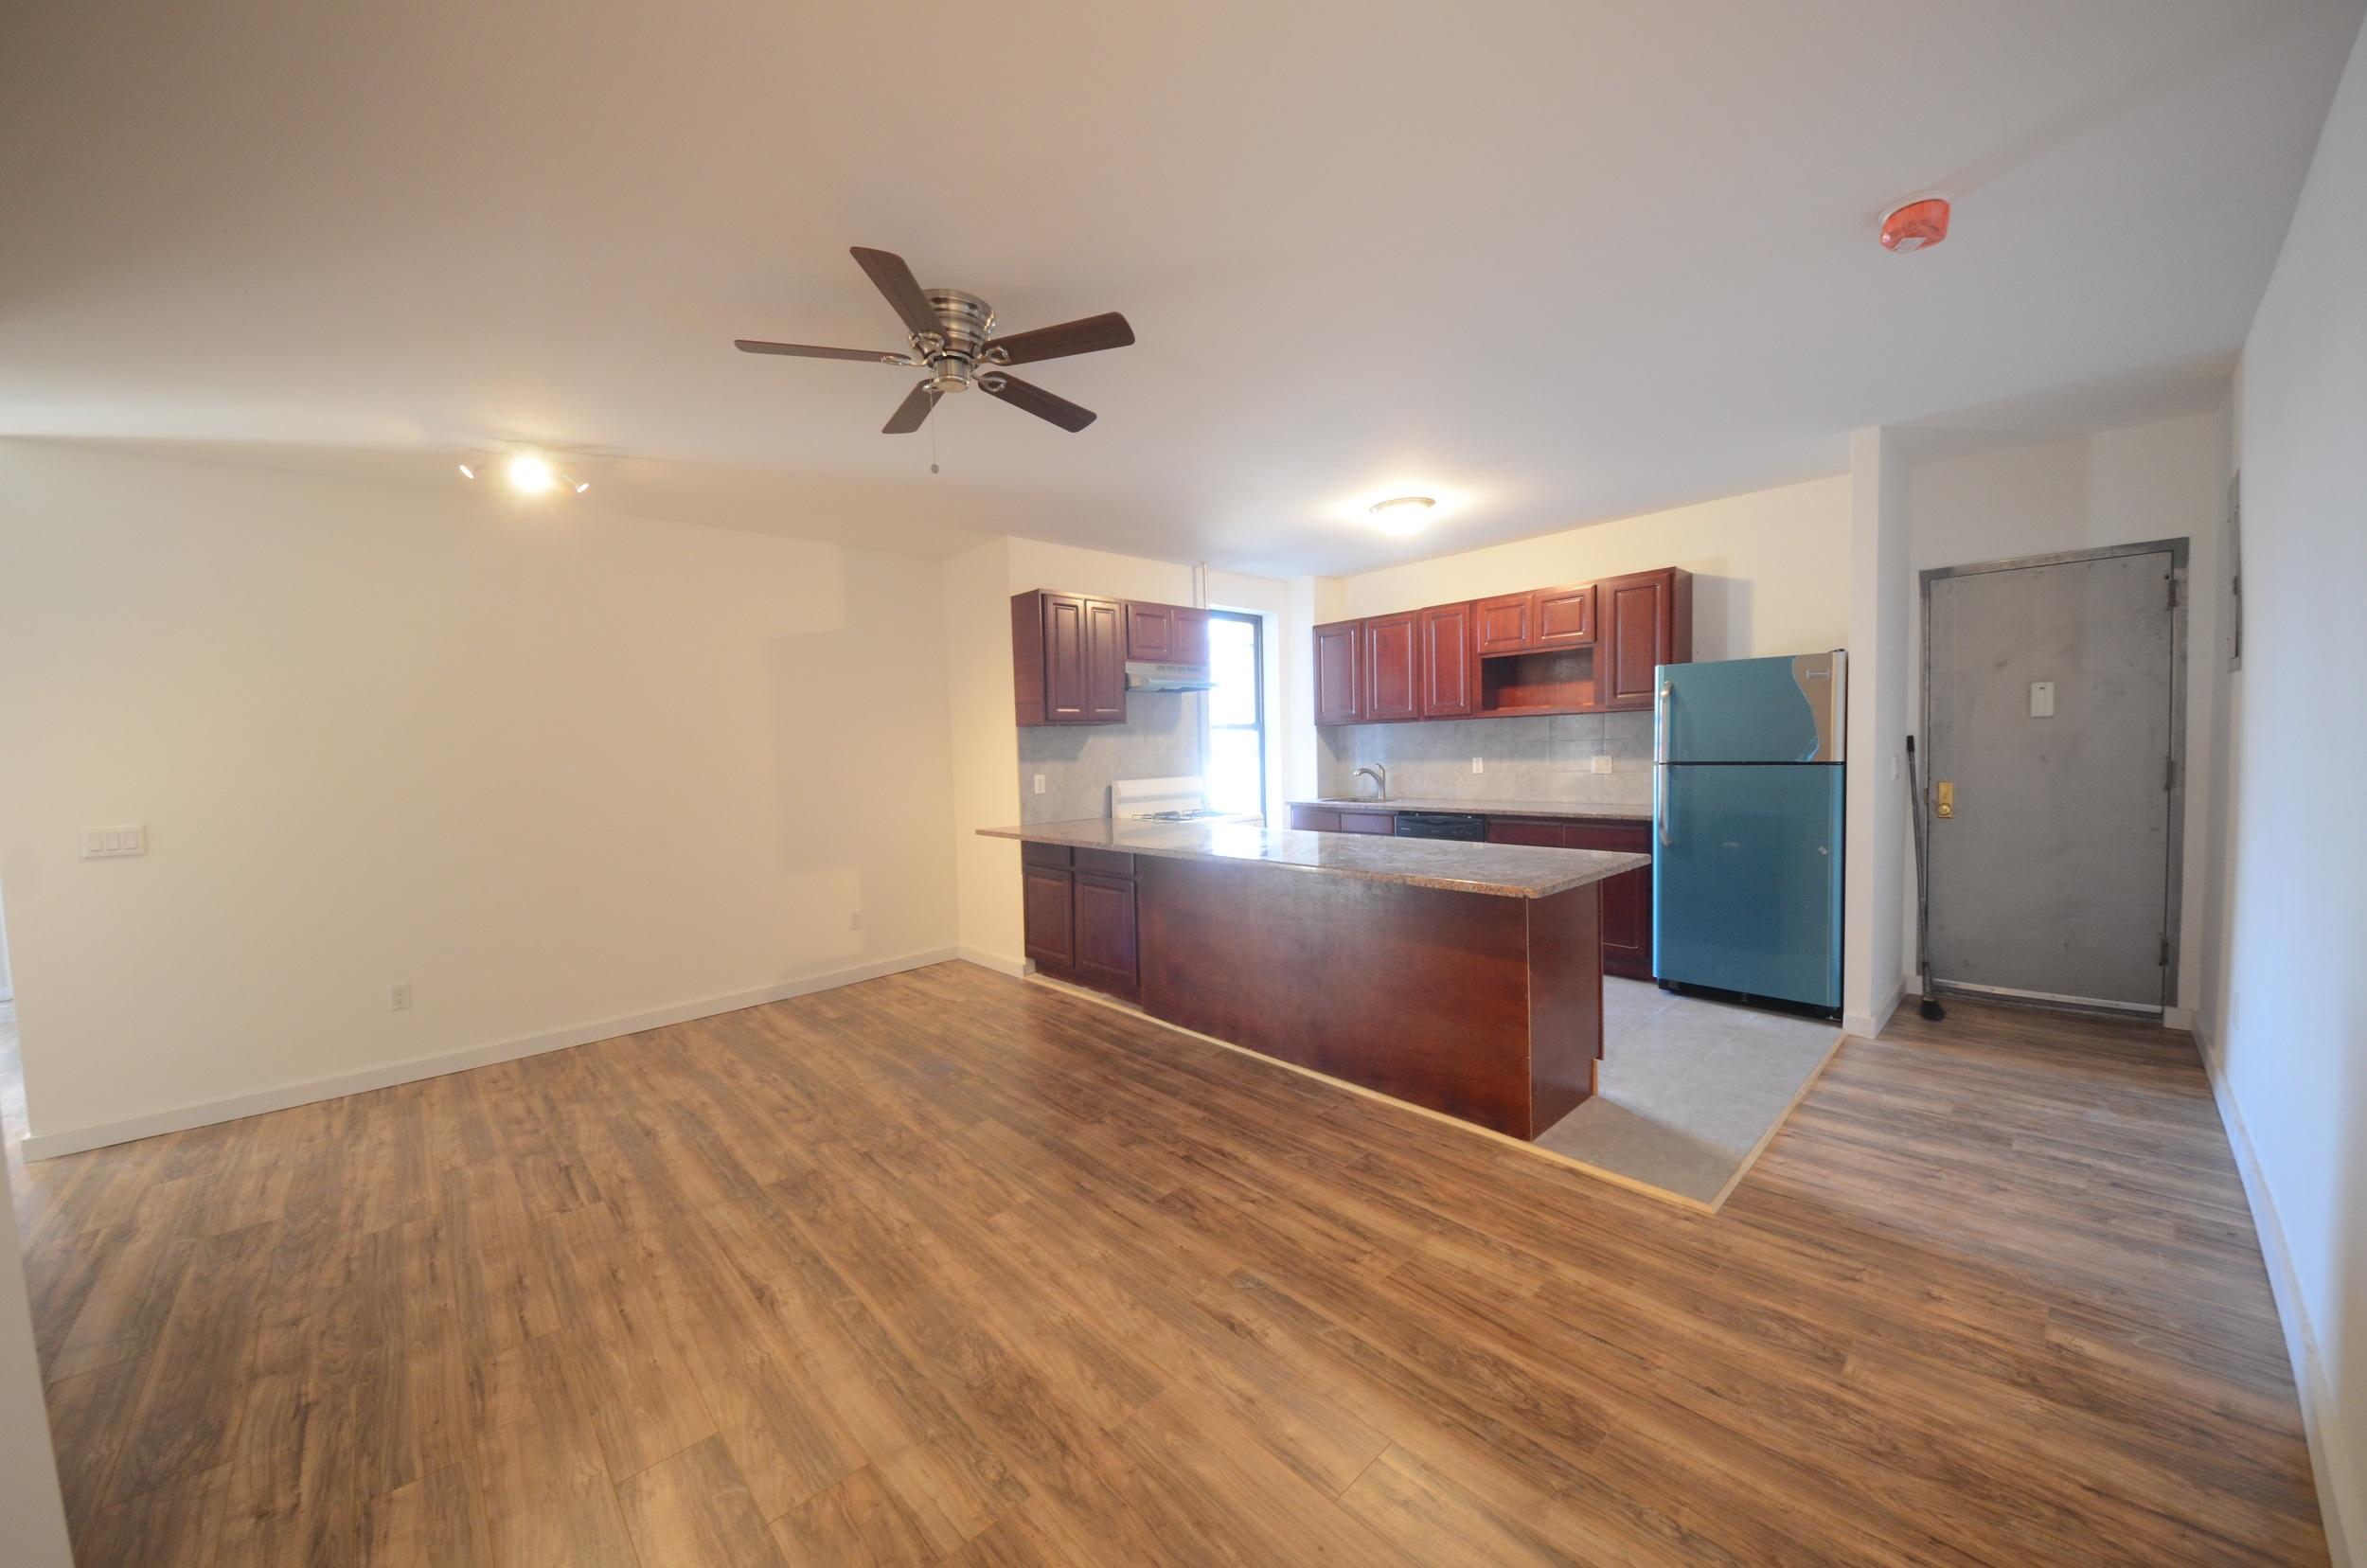 265 4th Ave, Apt 4 - 4 Bed/1 Bath in Park SlopeRENTED - $5000/month